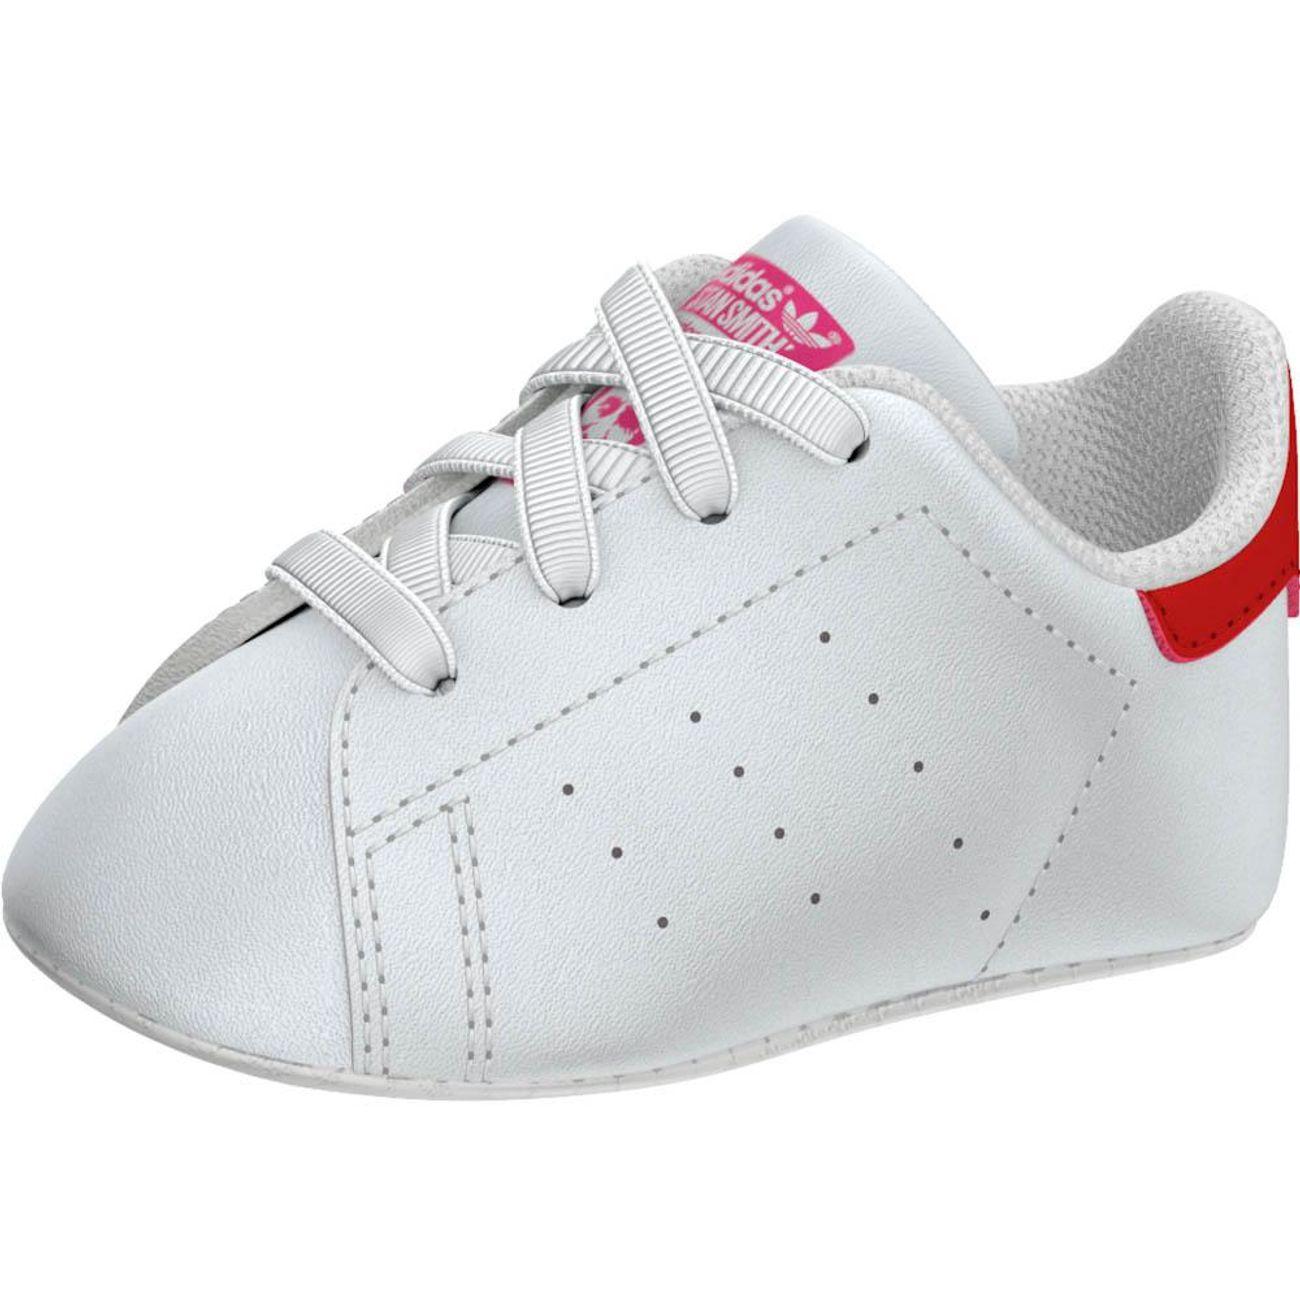 Tennis homme ADIDAS ORIGINALS Adidas Originals Stan Smith Crib